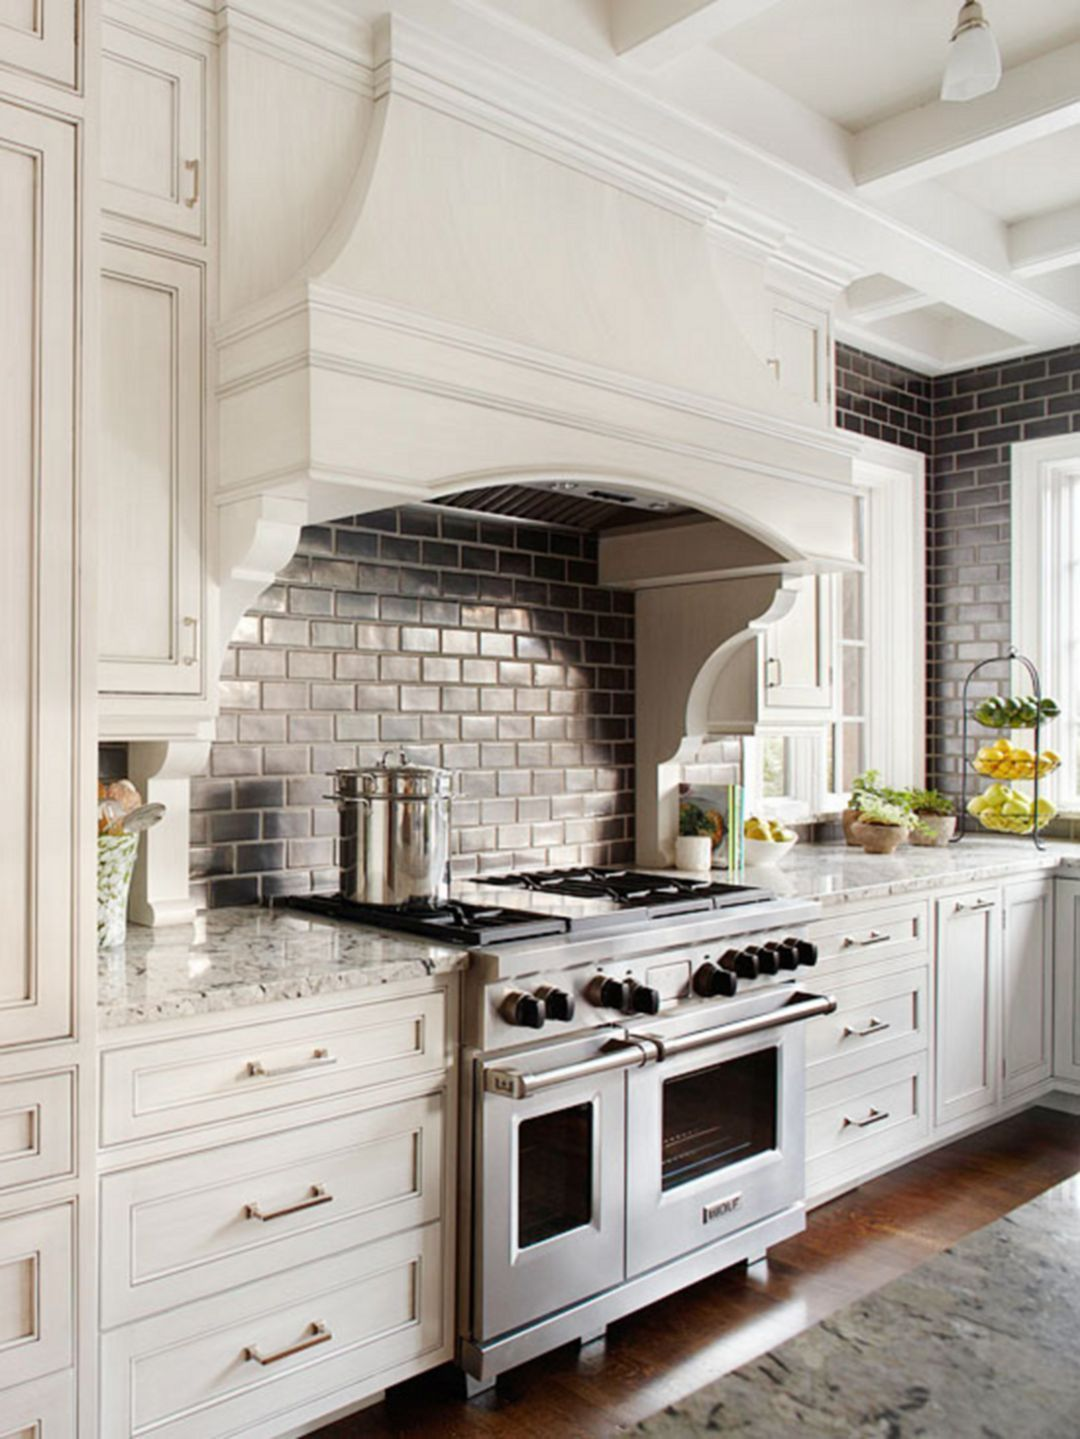 25 Most Amazing Kitchen With Range Hood Ideas Traditional Kitchen Design Trendy Kitchen Tile Kitchen Hoods